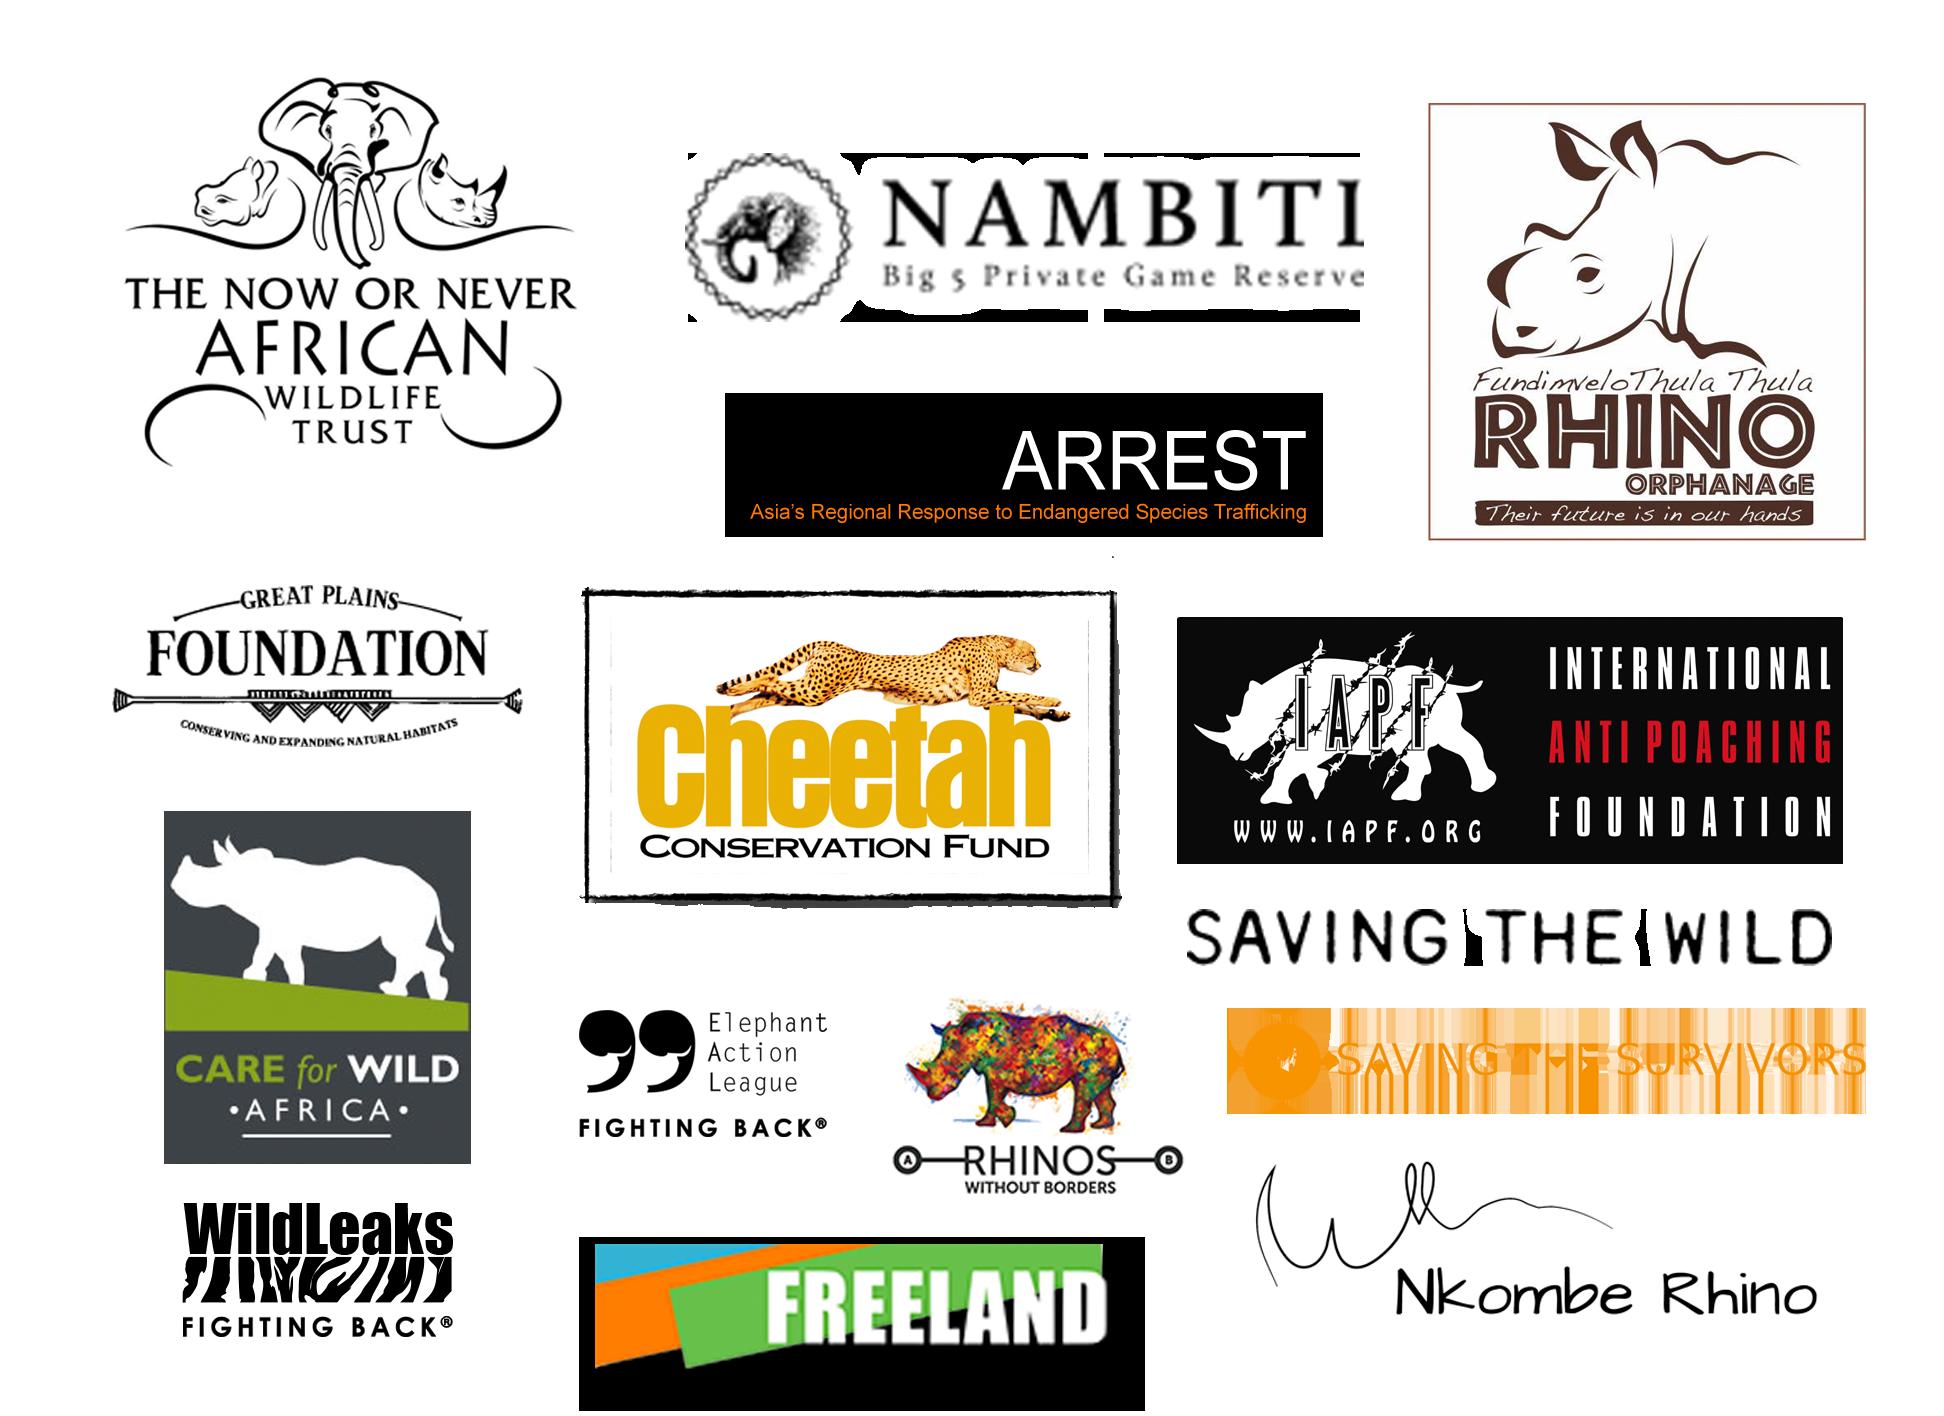 Rhino Elephant  Extinction  Poaching